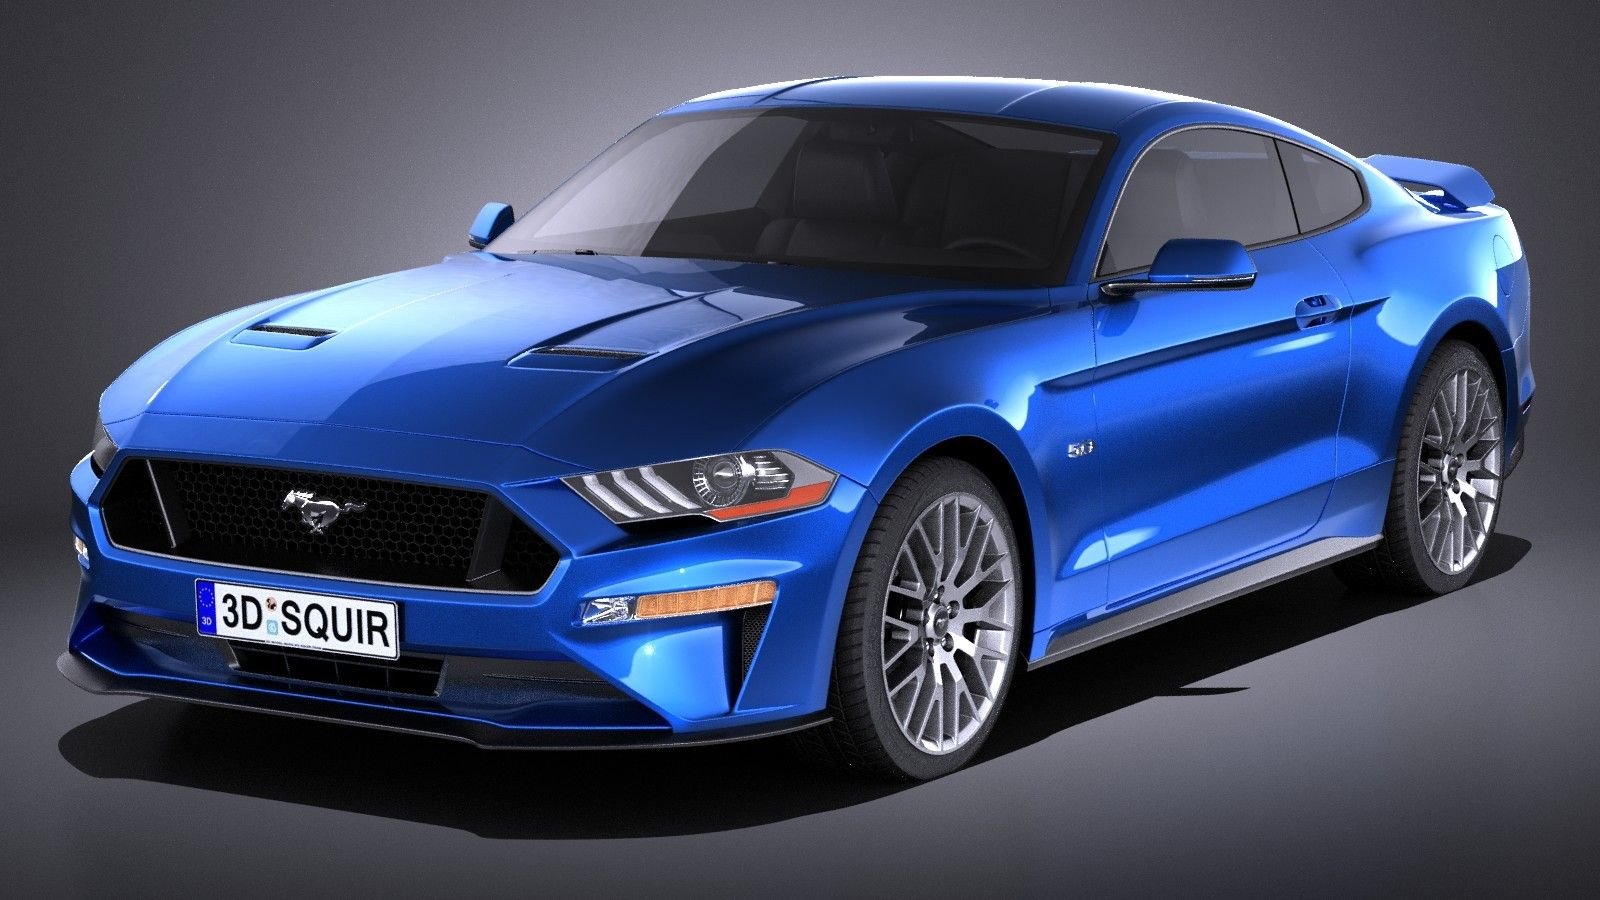 3d Model Mustang 2018 Ford Mustang Gt Mustang Gt Muscle Cars